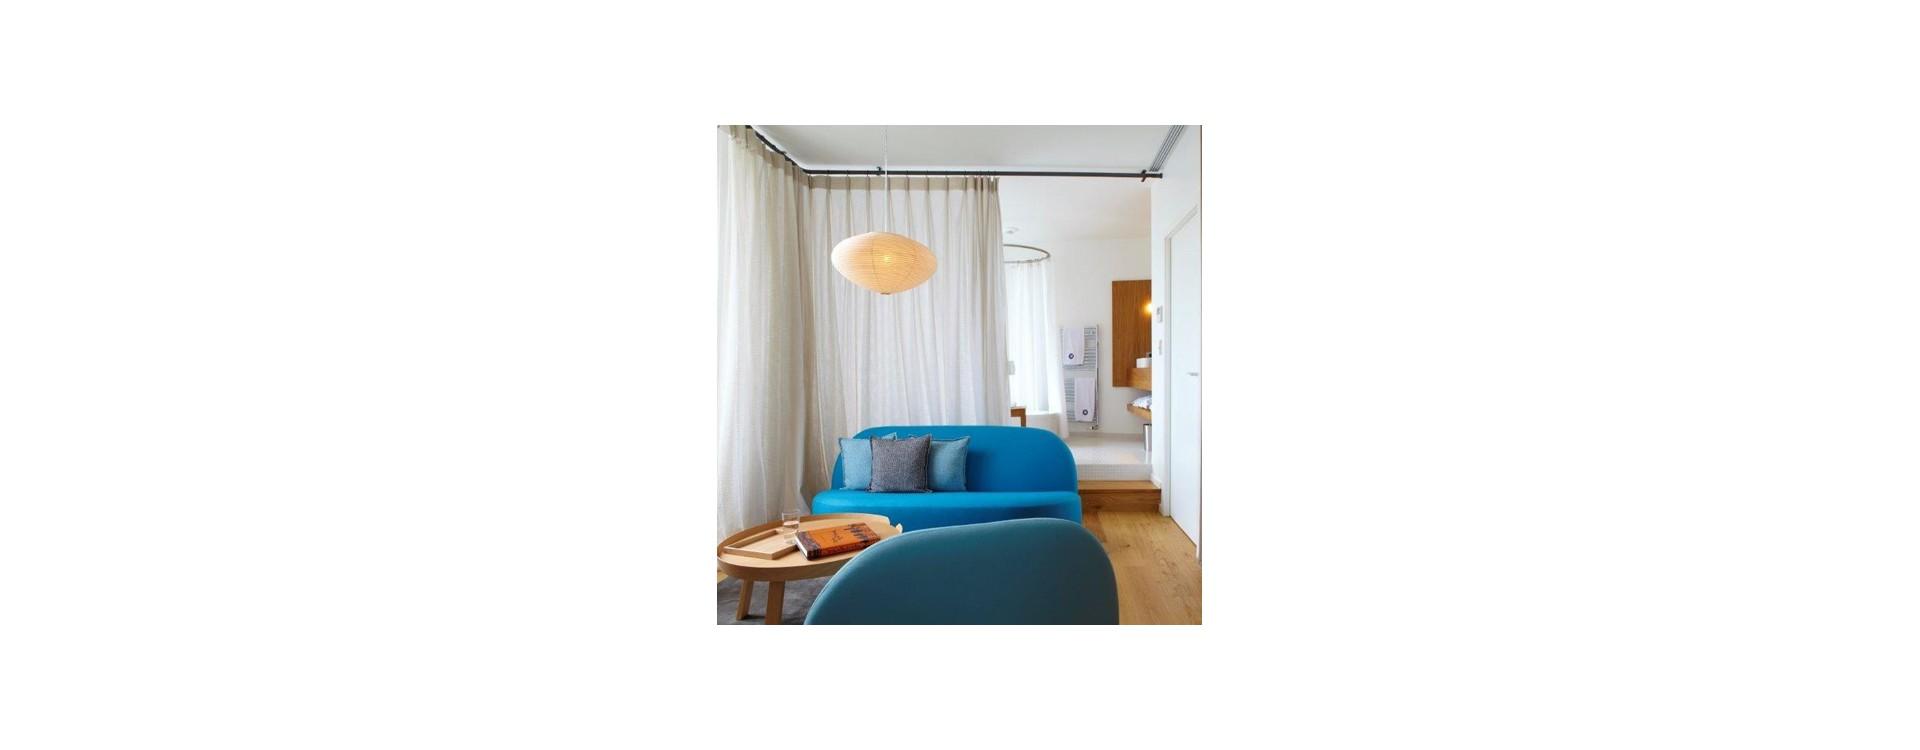 galbobain equipe la baignoire presqu 39 ile de jacob delafon galbobain. Black Bedroom Furniture Sets. Home Design Ideas